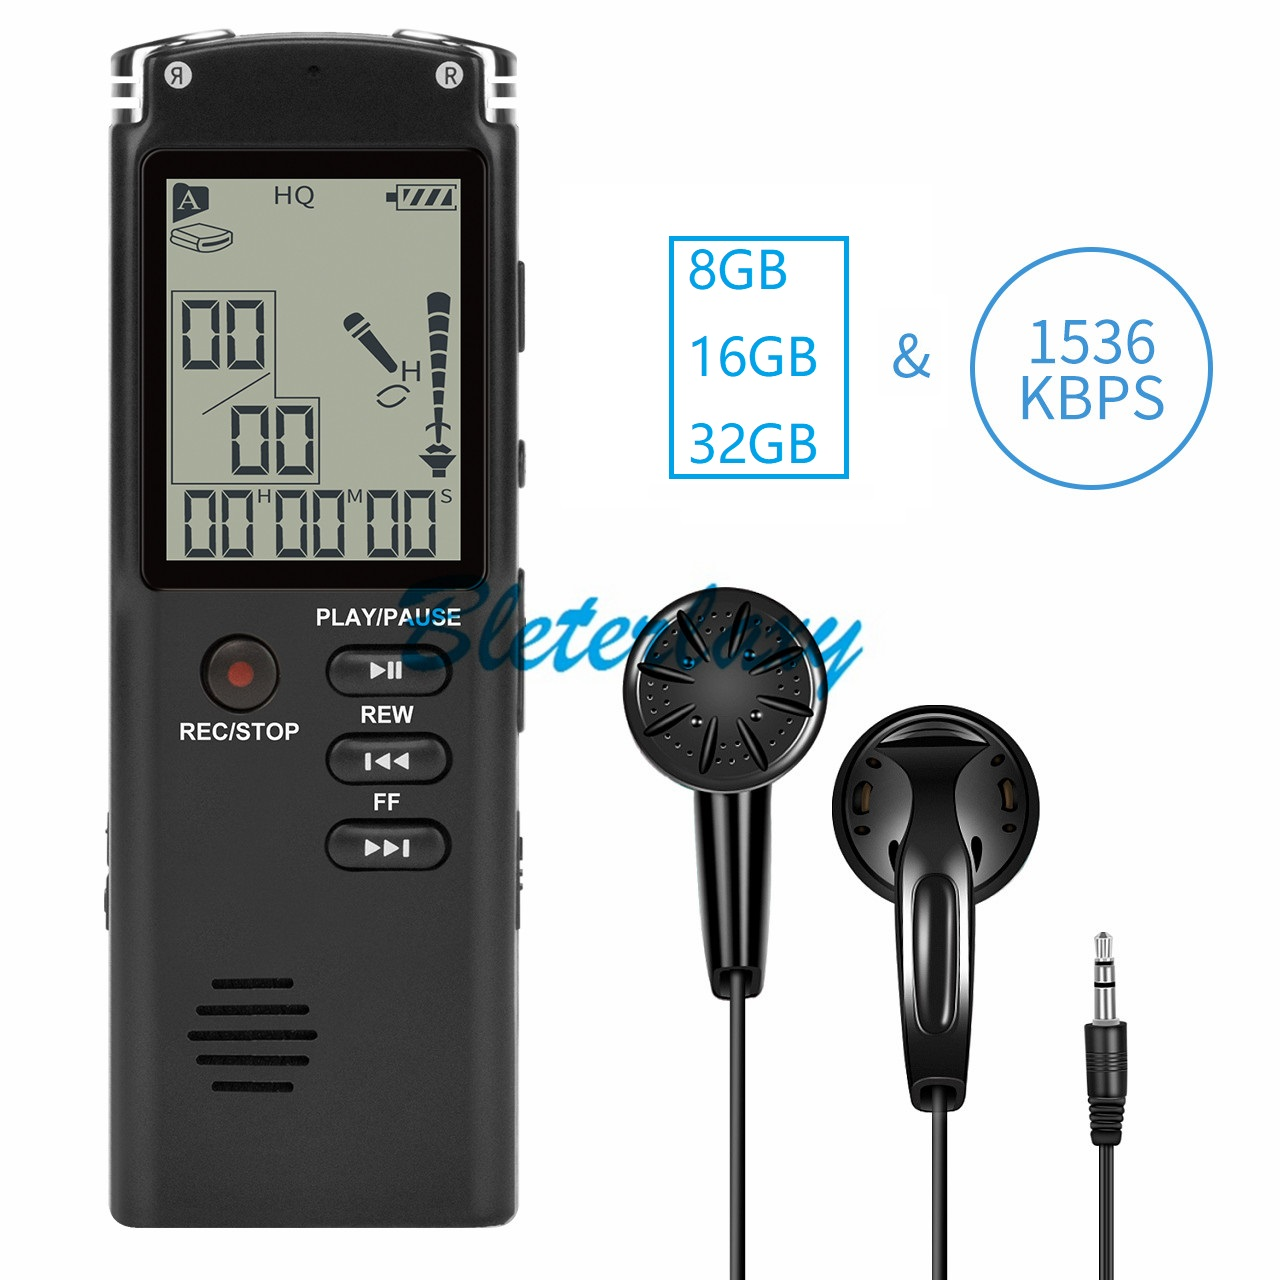 8GB/16GB/32GB ses kaydedici USB profesyonel 96 saat kulaklık dijital ses kaydedici WAV,MP3 oyuncu